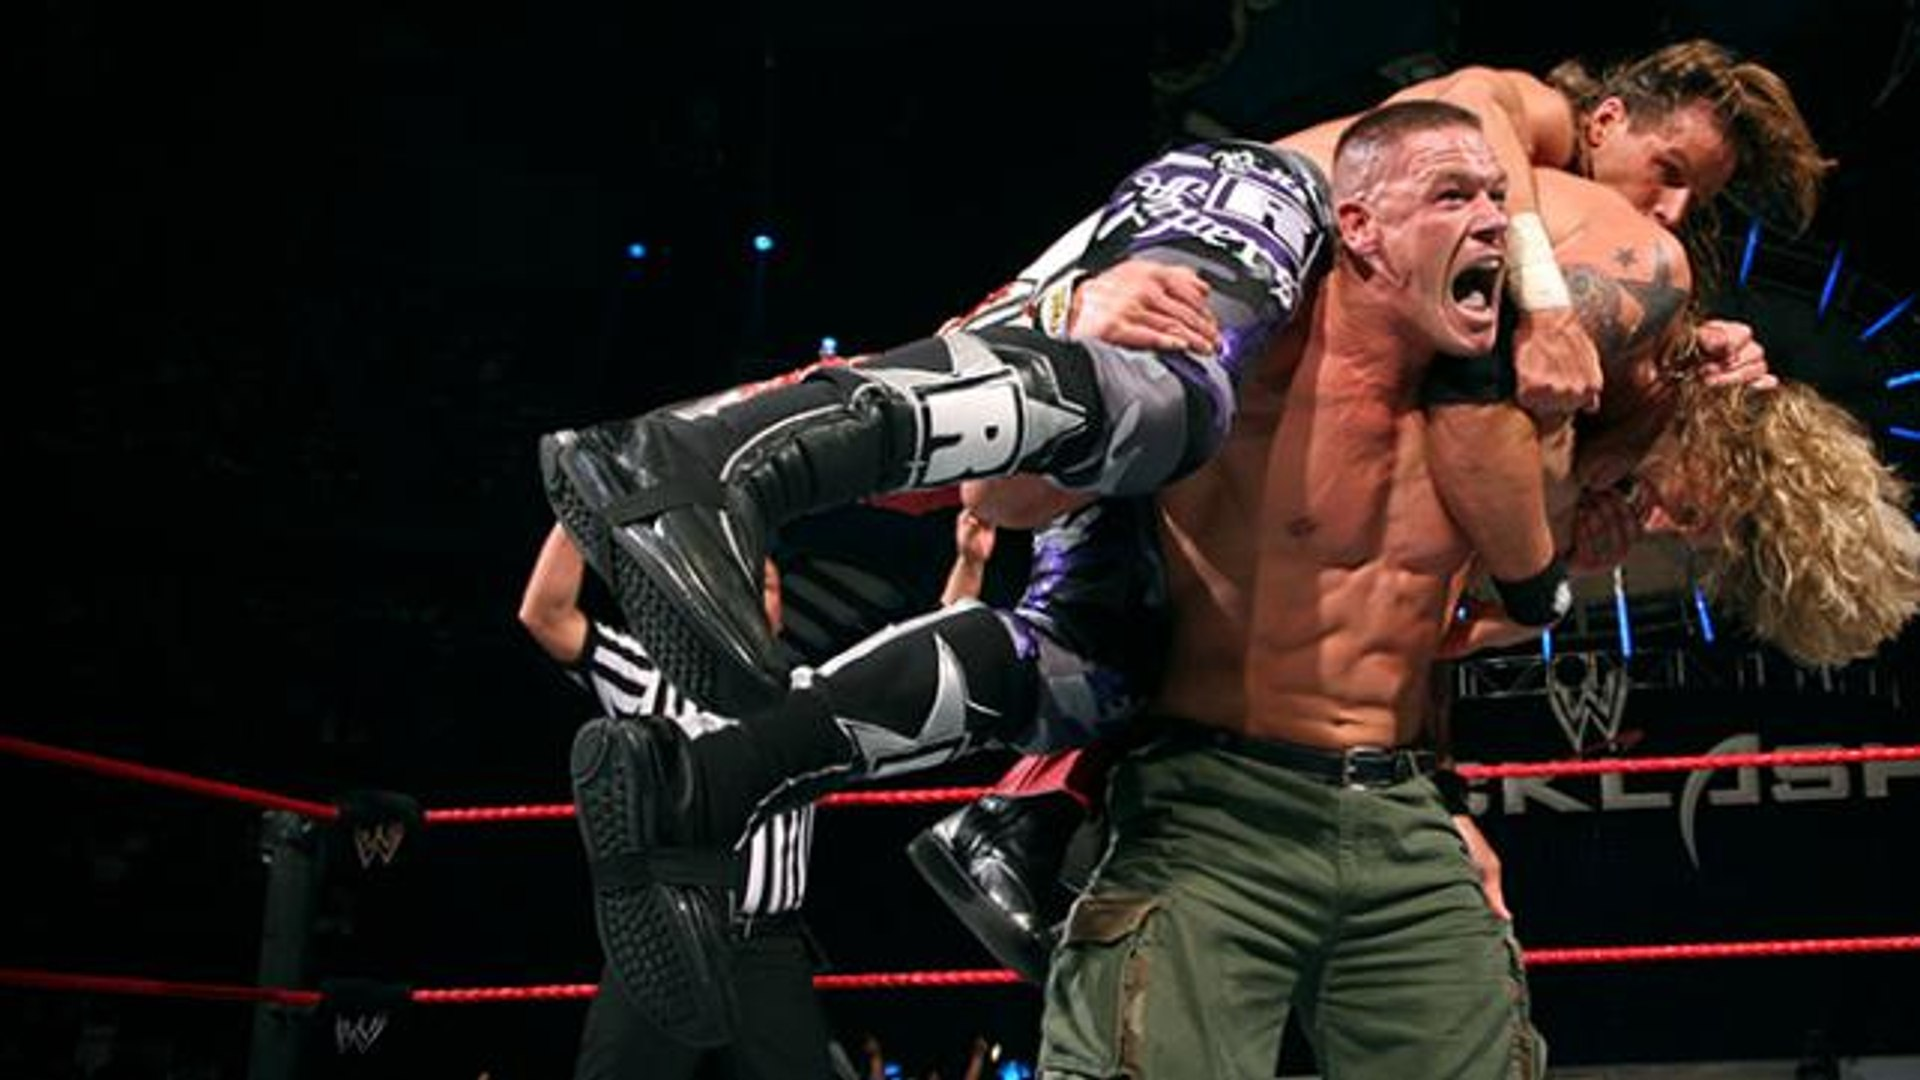 Image result for WWE Backlash 2007 John Cena vs Edge vs Randy Orton vs Shawn Michaels wwe.com